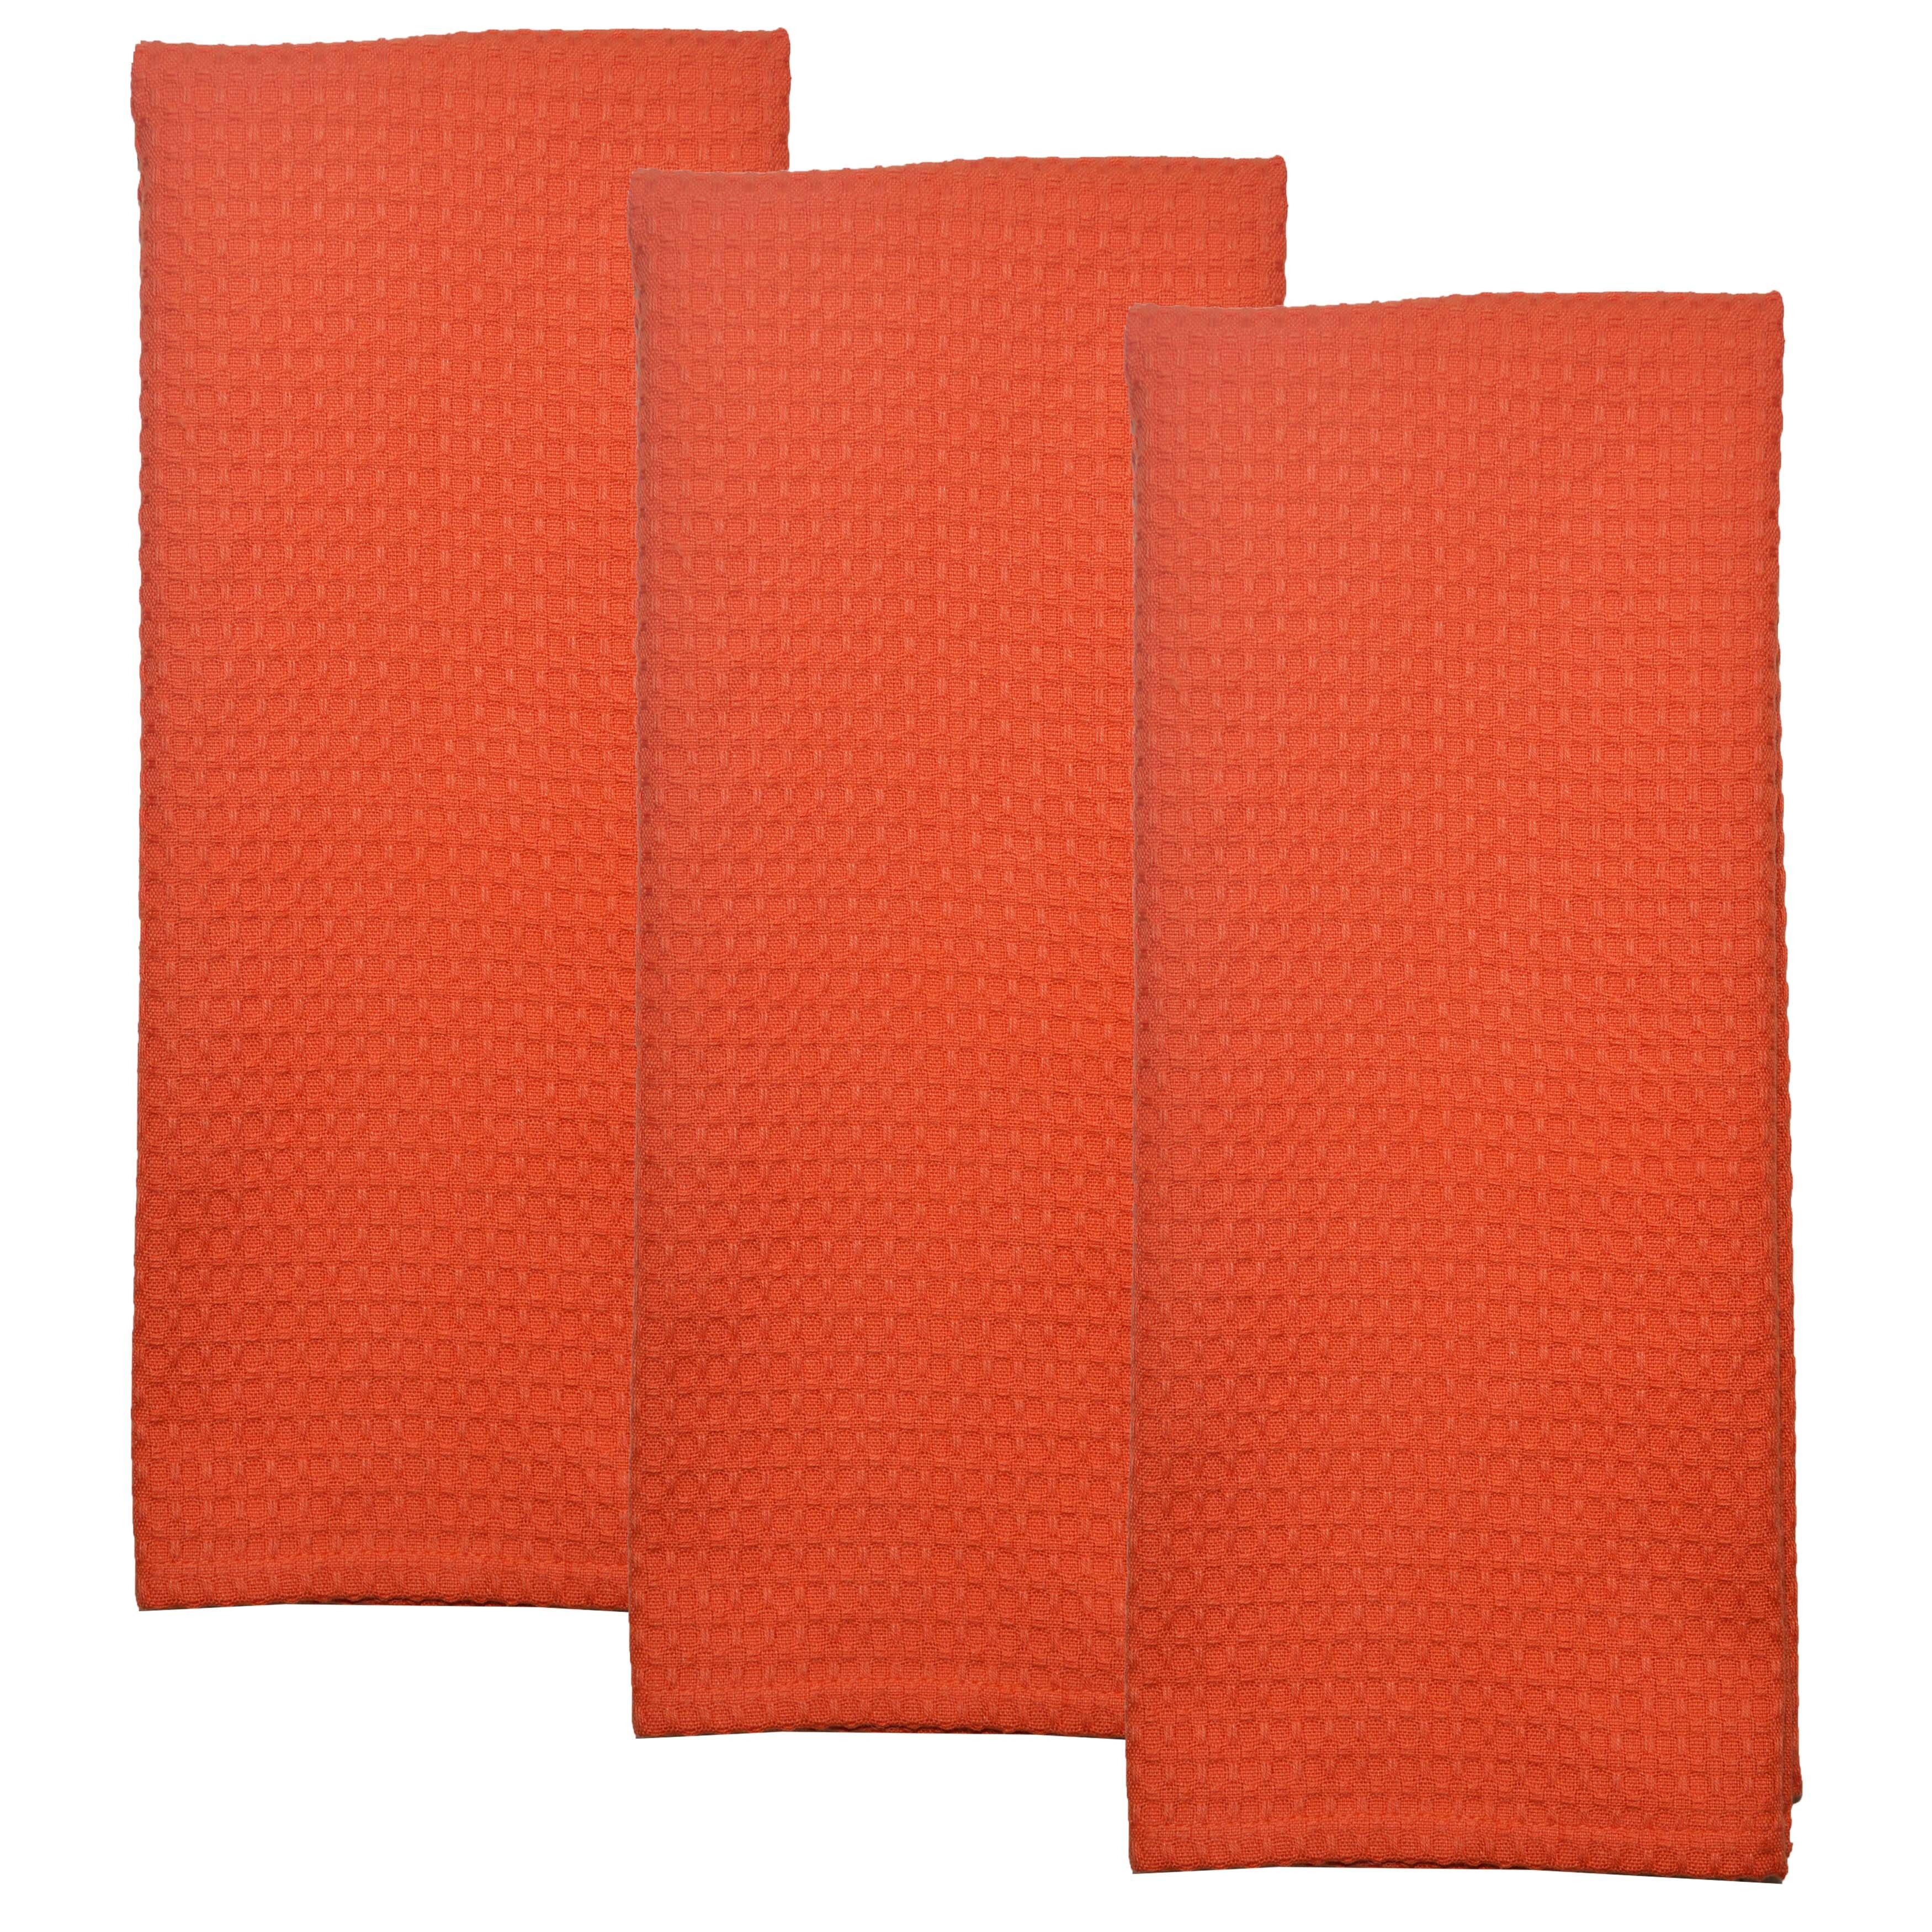 Orange Kitchen Towels You Ll Love In 2021 Wayfair